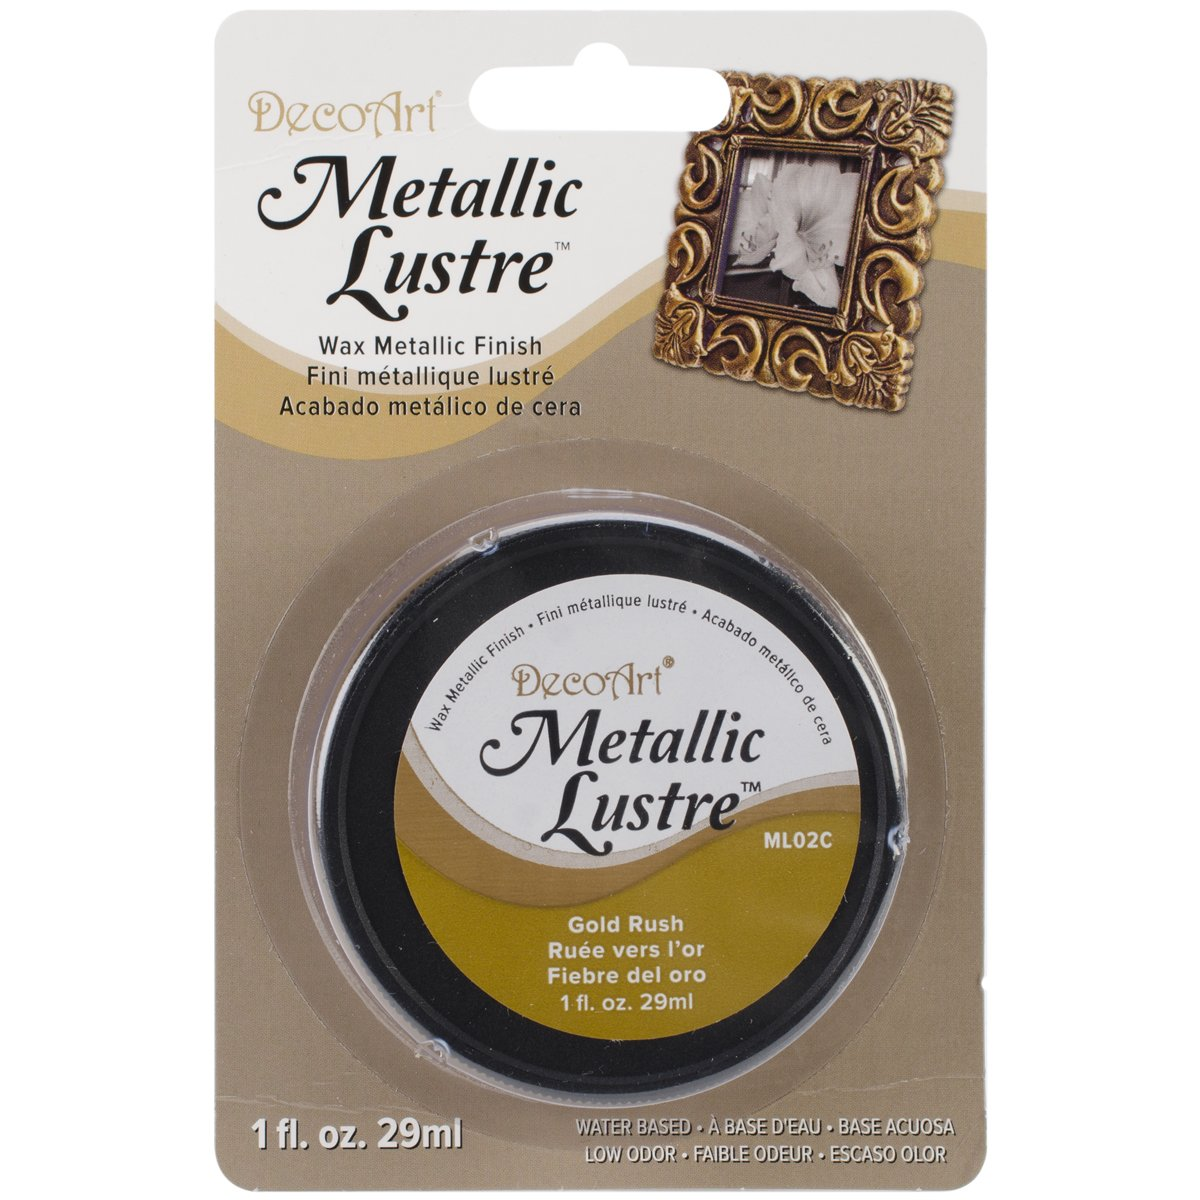 DecoArt ML02C-28 Metallic Lustre Wax, 1-Ounce, Gold Rush Notions